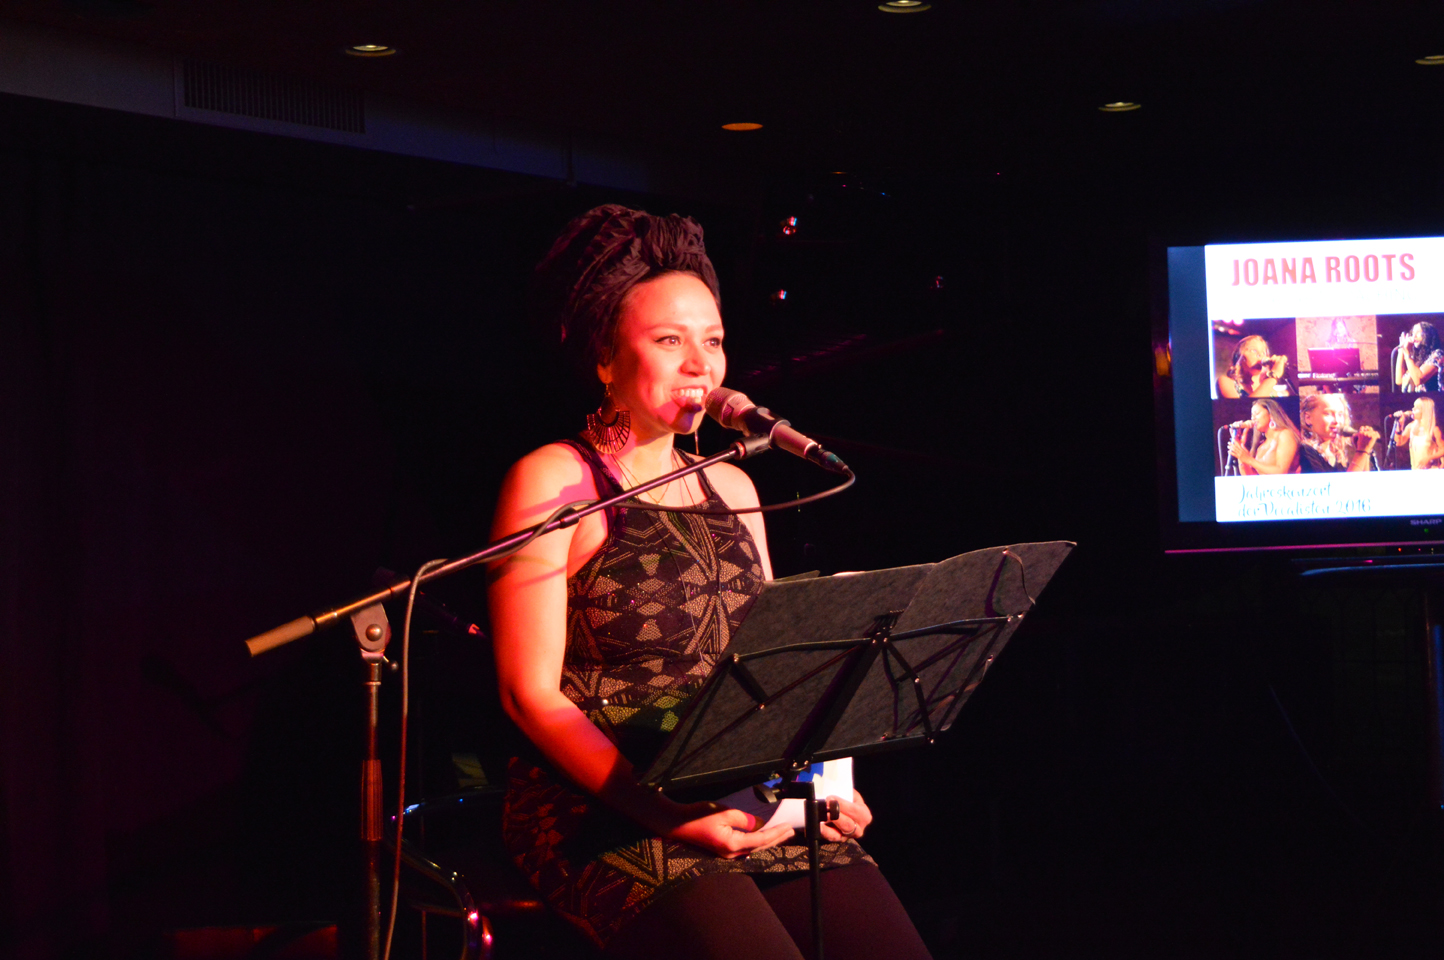 Mahogany Hall Vocal Art Konzert 2016 Joana Roots Anmoderation